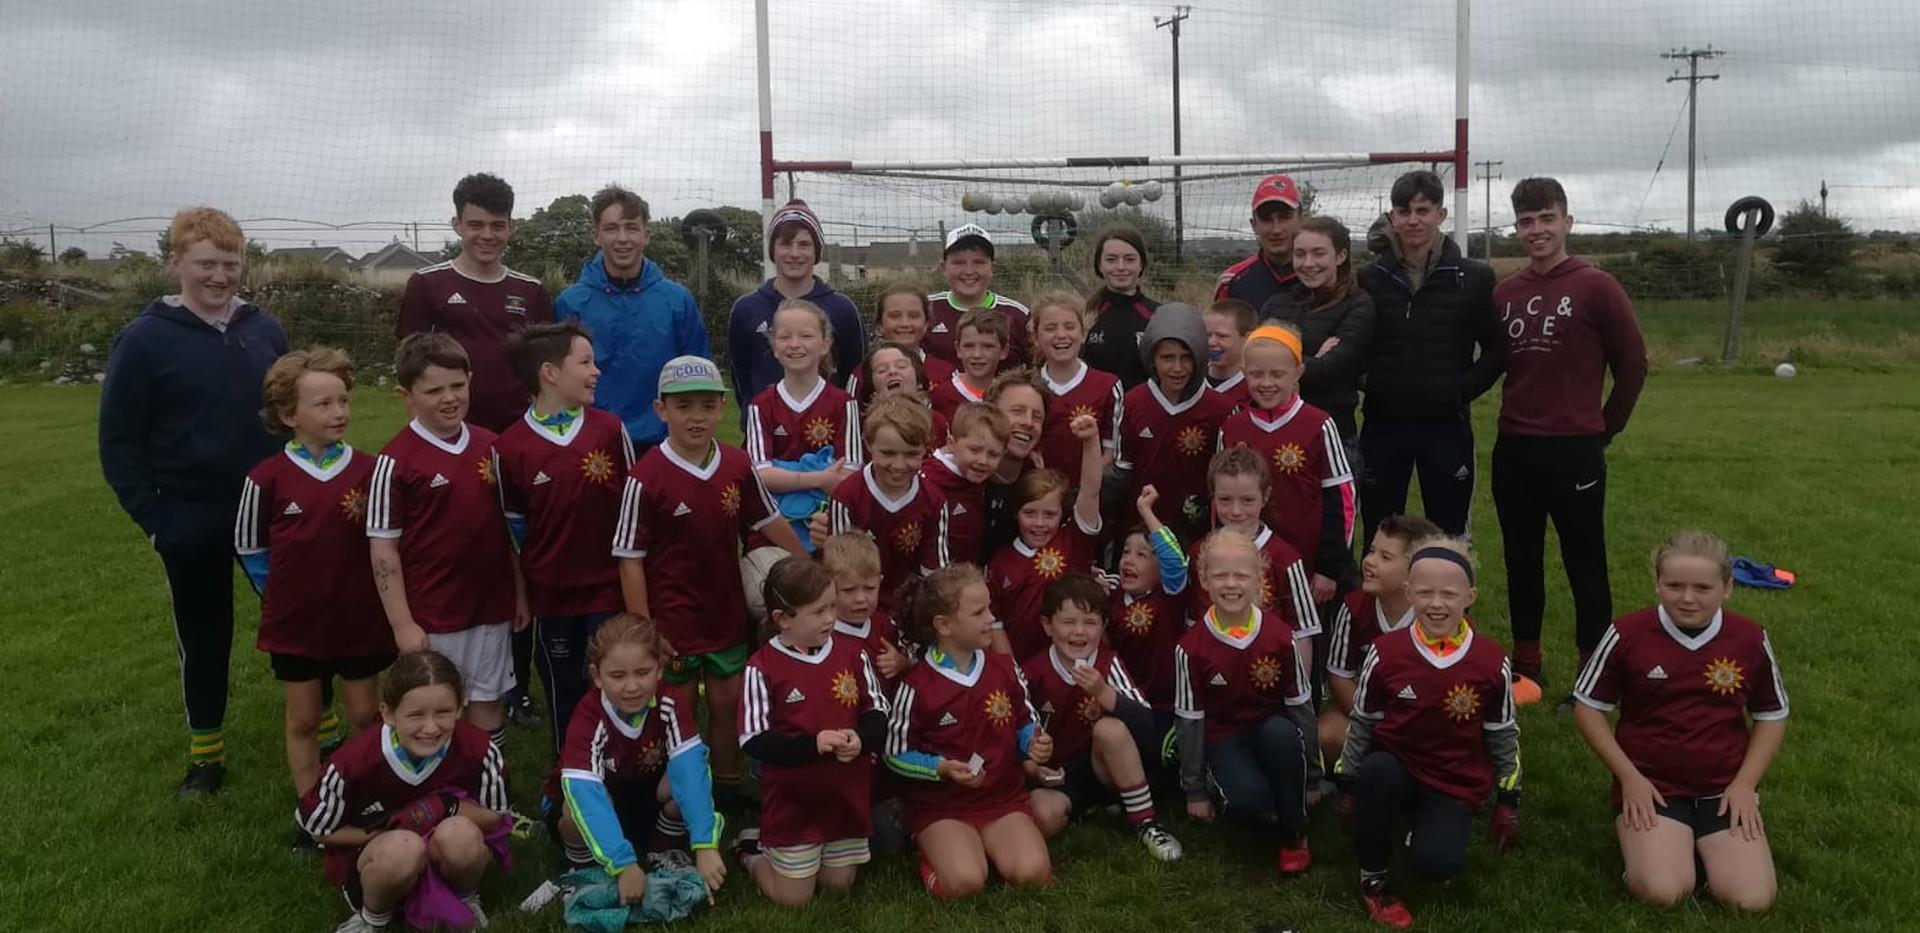 Cromane GAA summer camp 2018